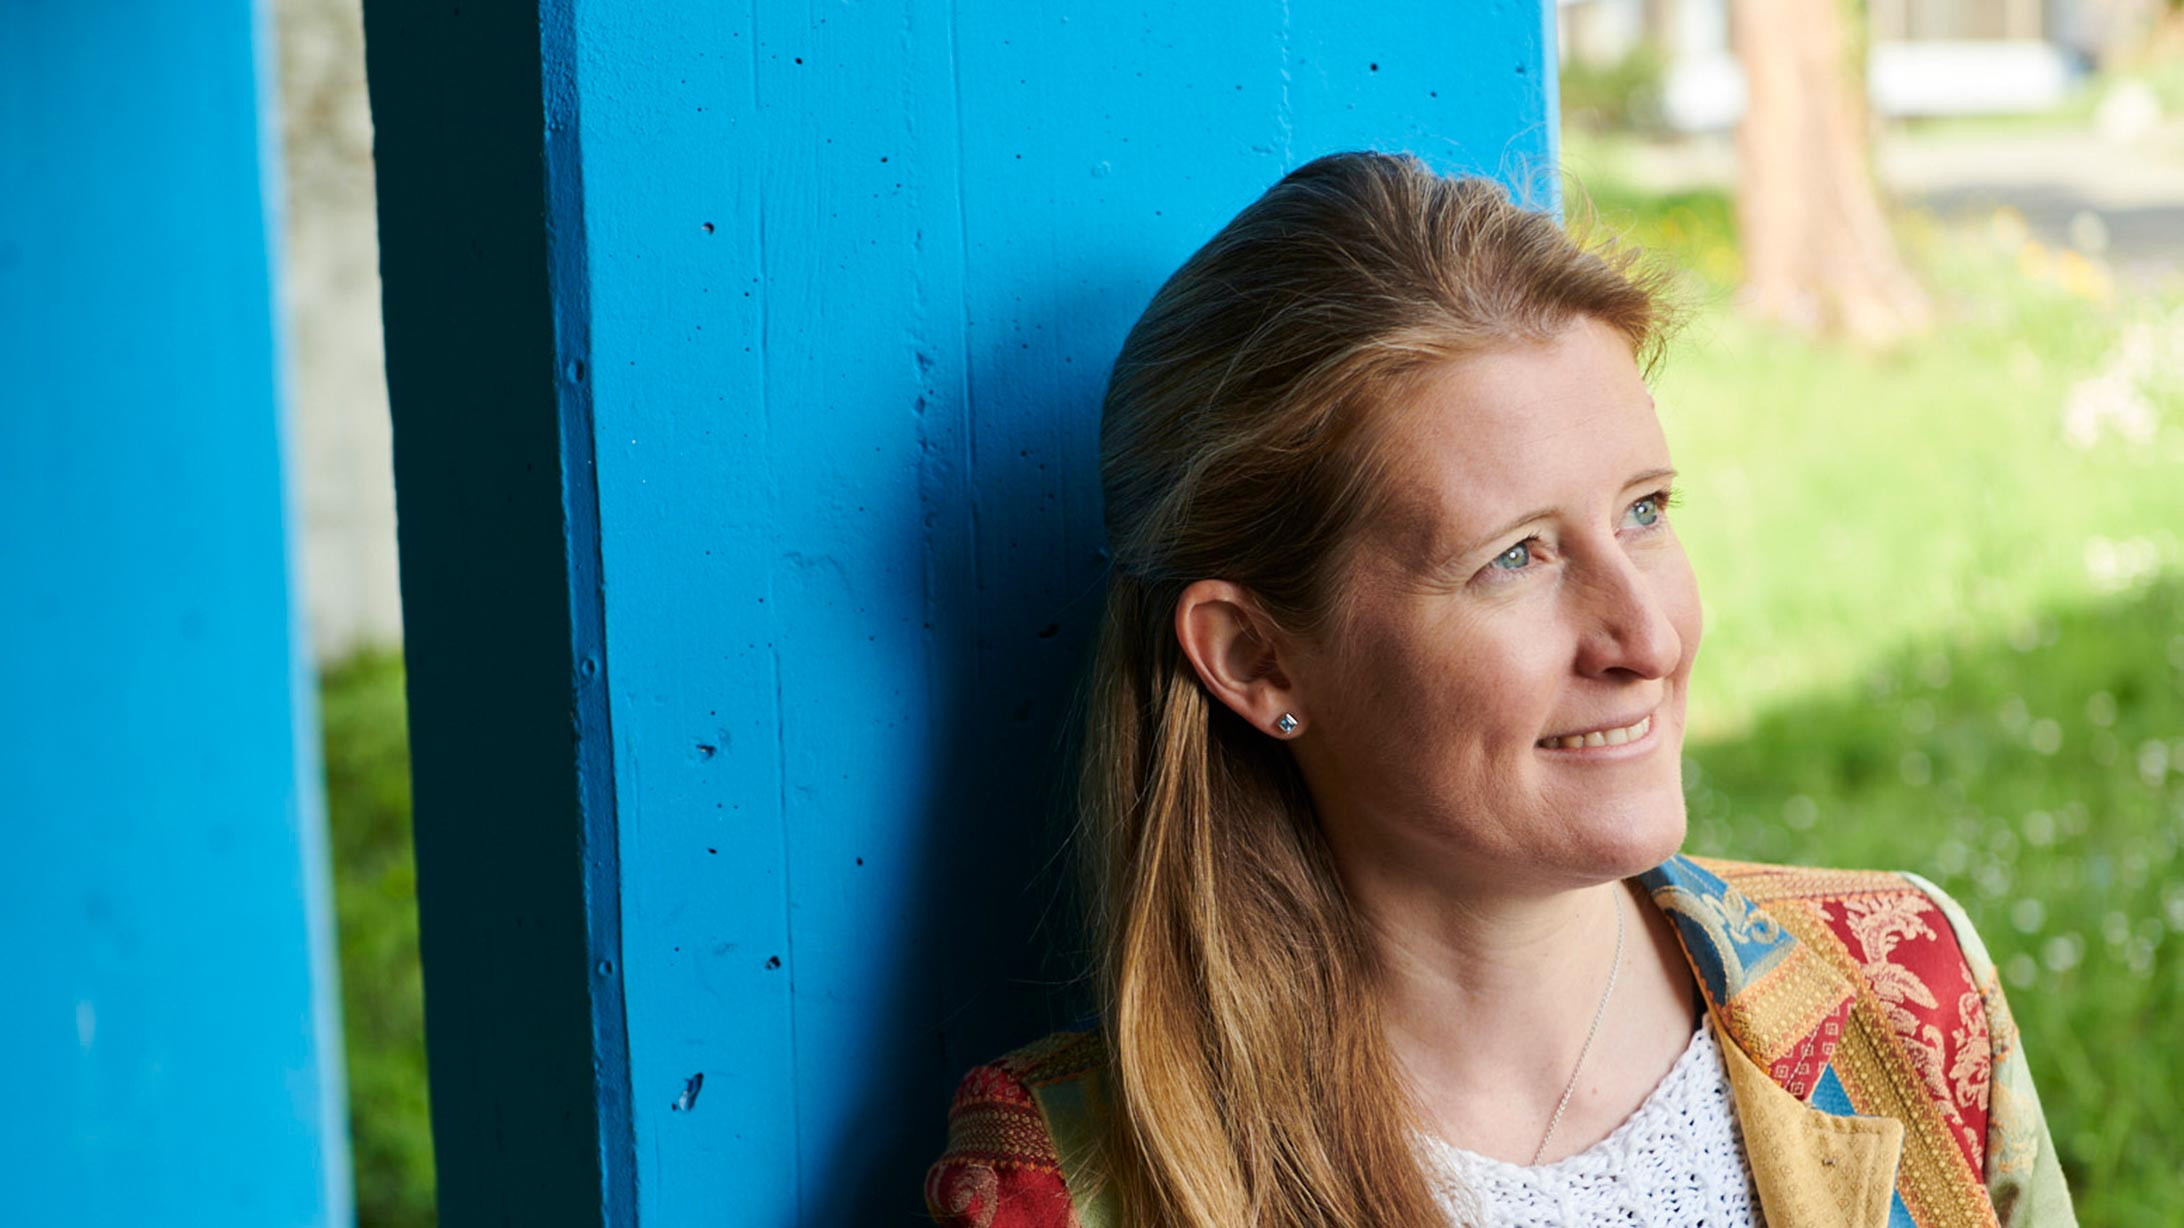 Irene Burger lehnt an eine blaue Säule